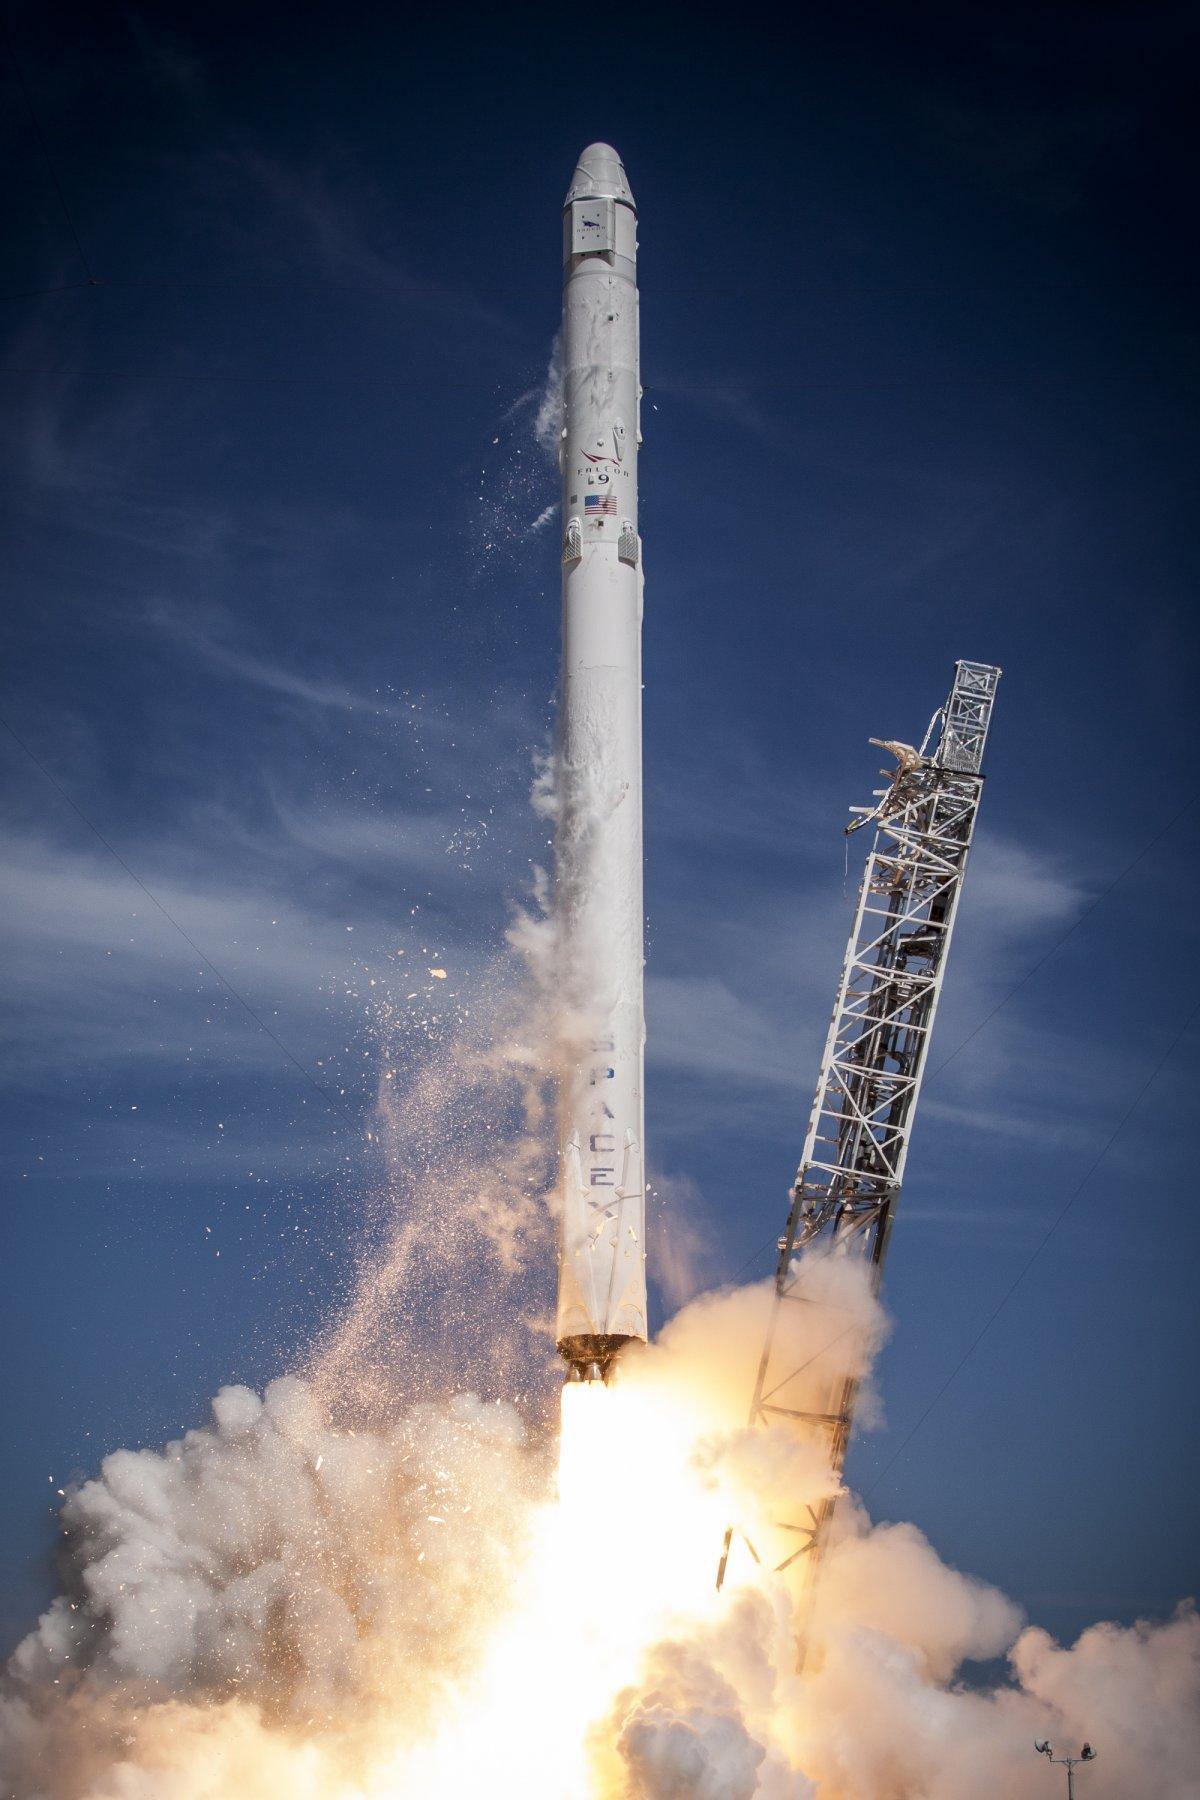 Best 55 SpaceX Wallpaper on HipWallpaper SpaceX Dragon 1200x1800